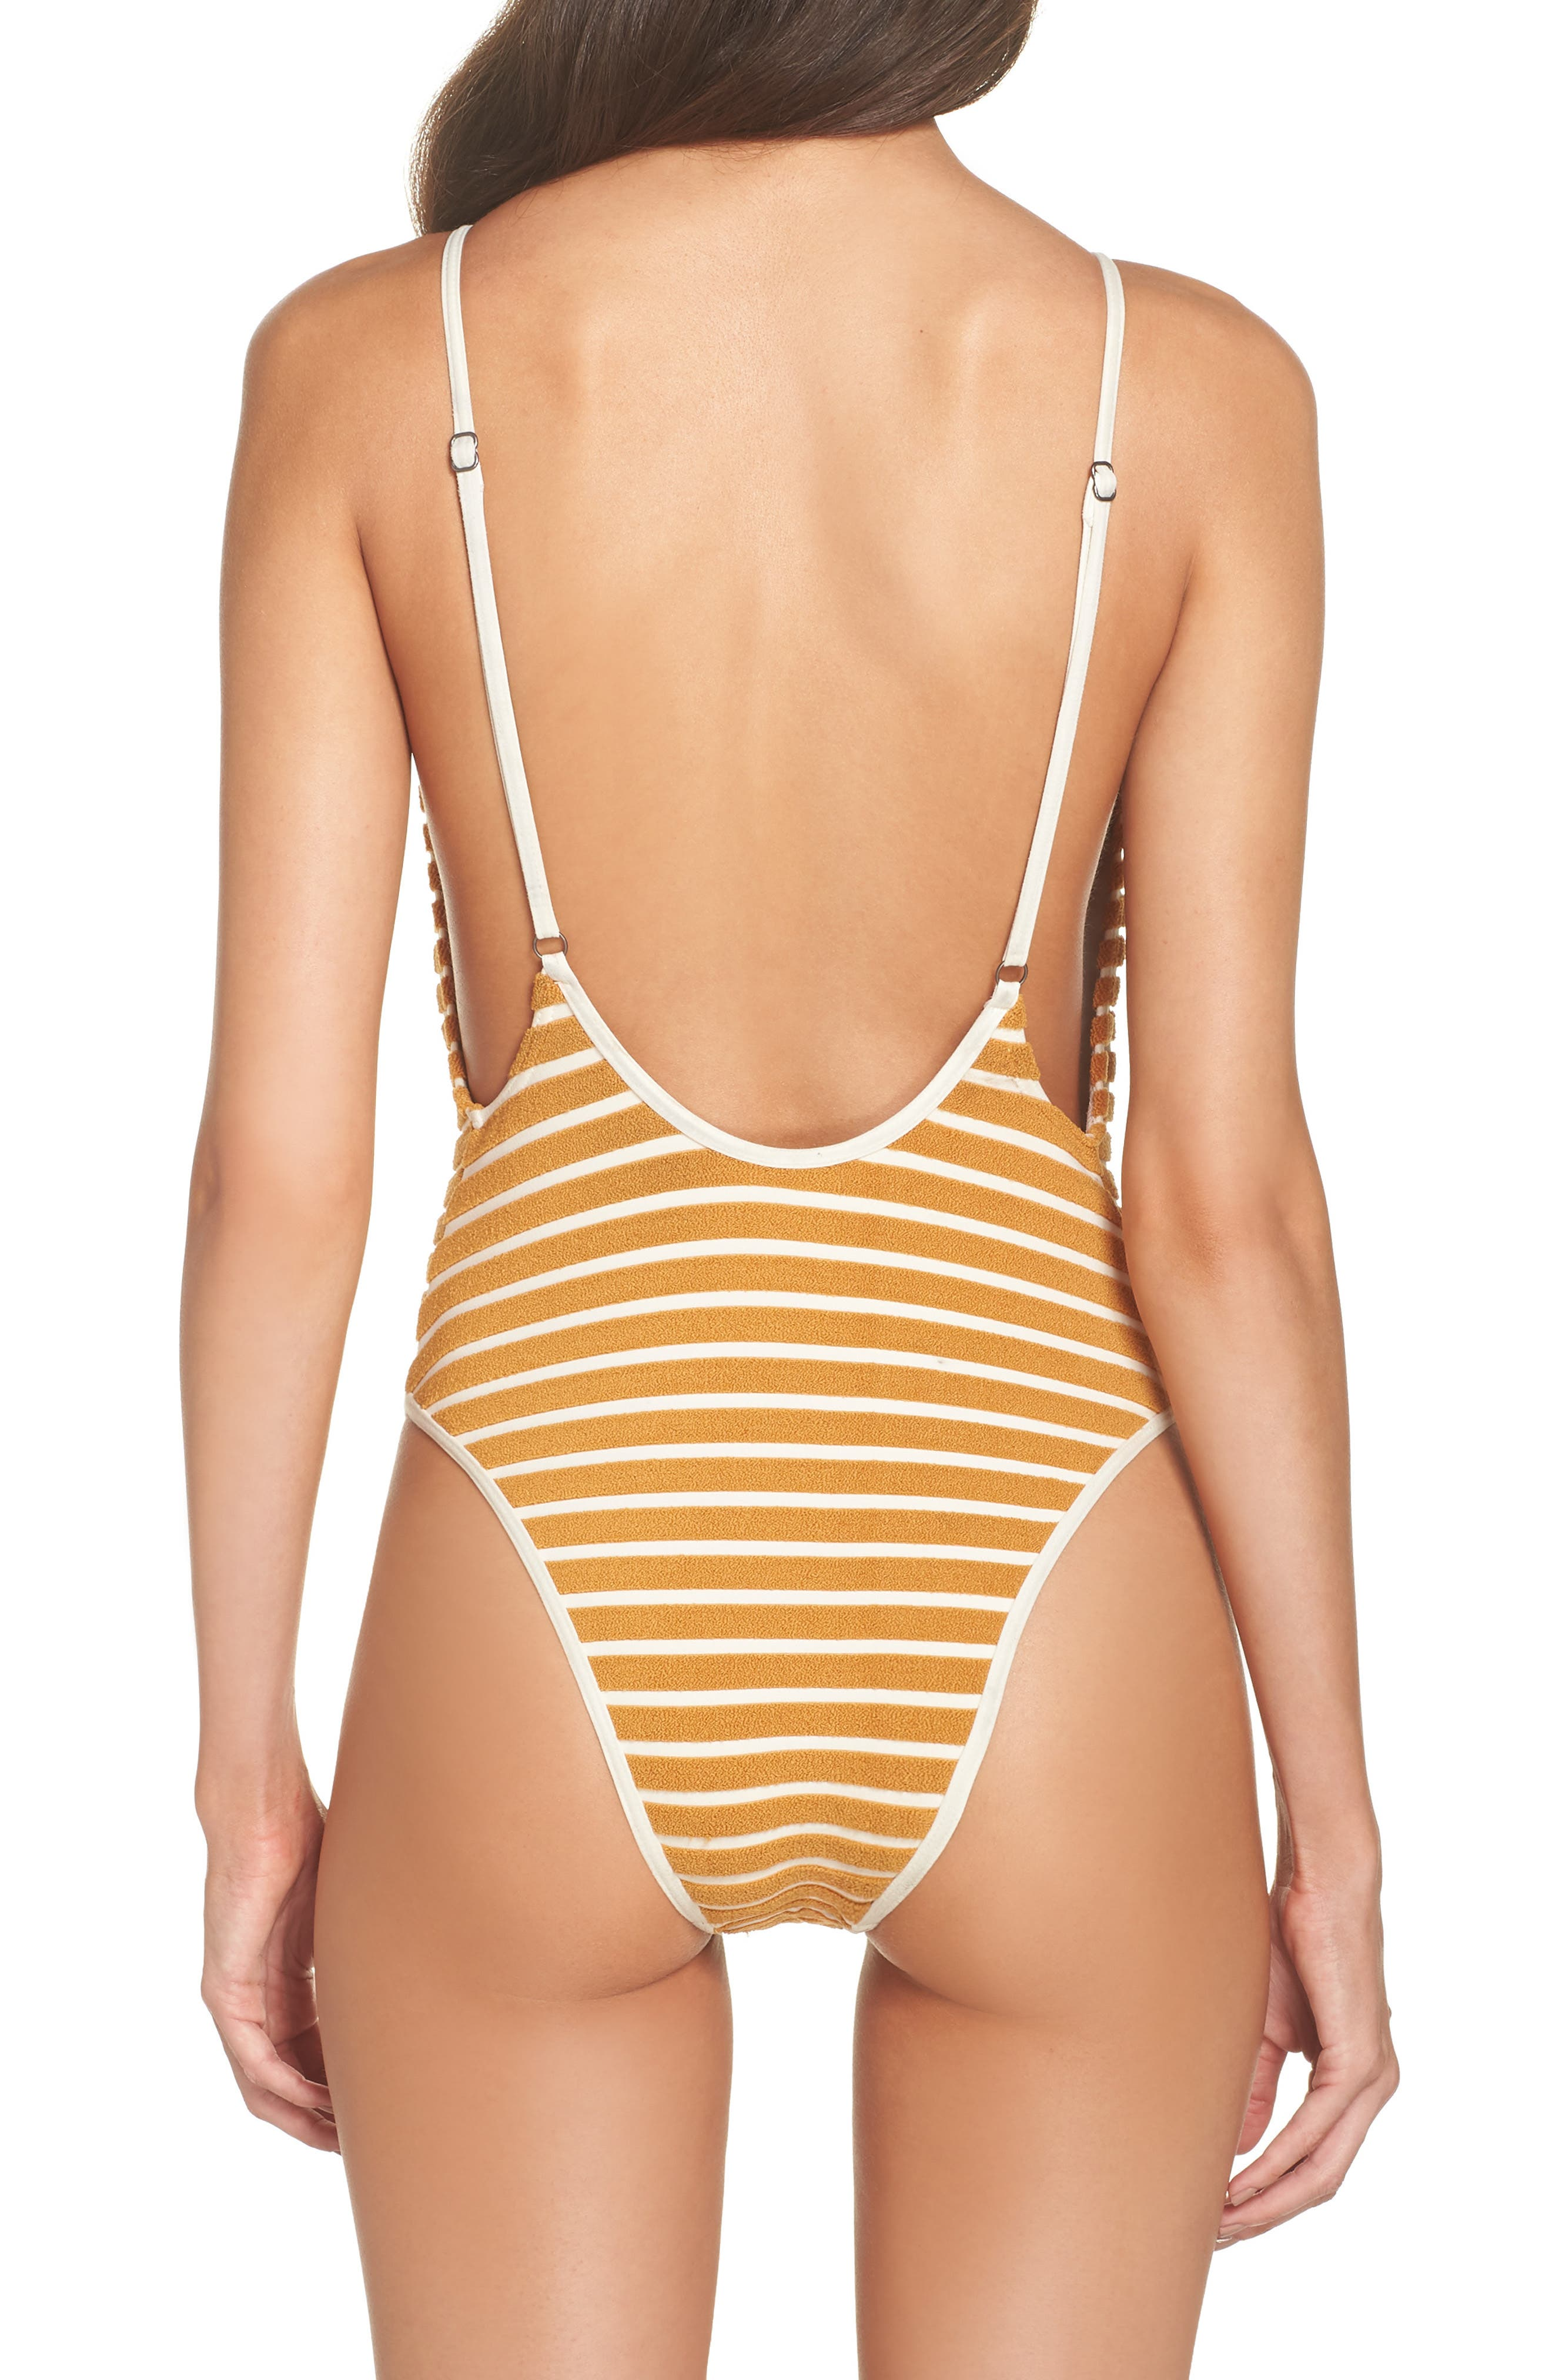 Honey Daze One-Piece Swimsuit,                             Alternate thumbnail 2, color,                             Honey Gold